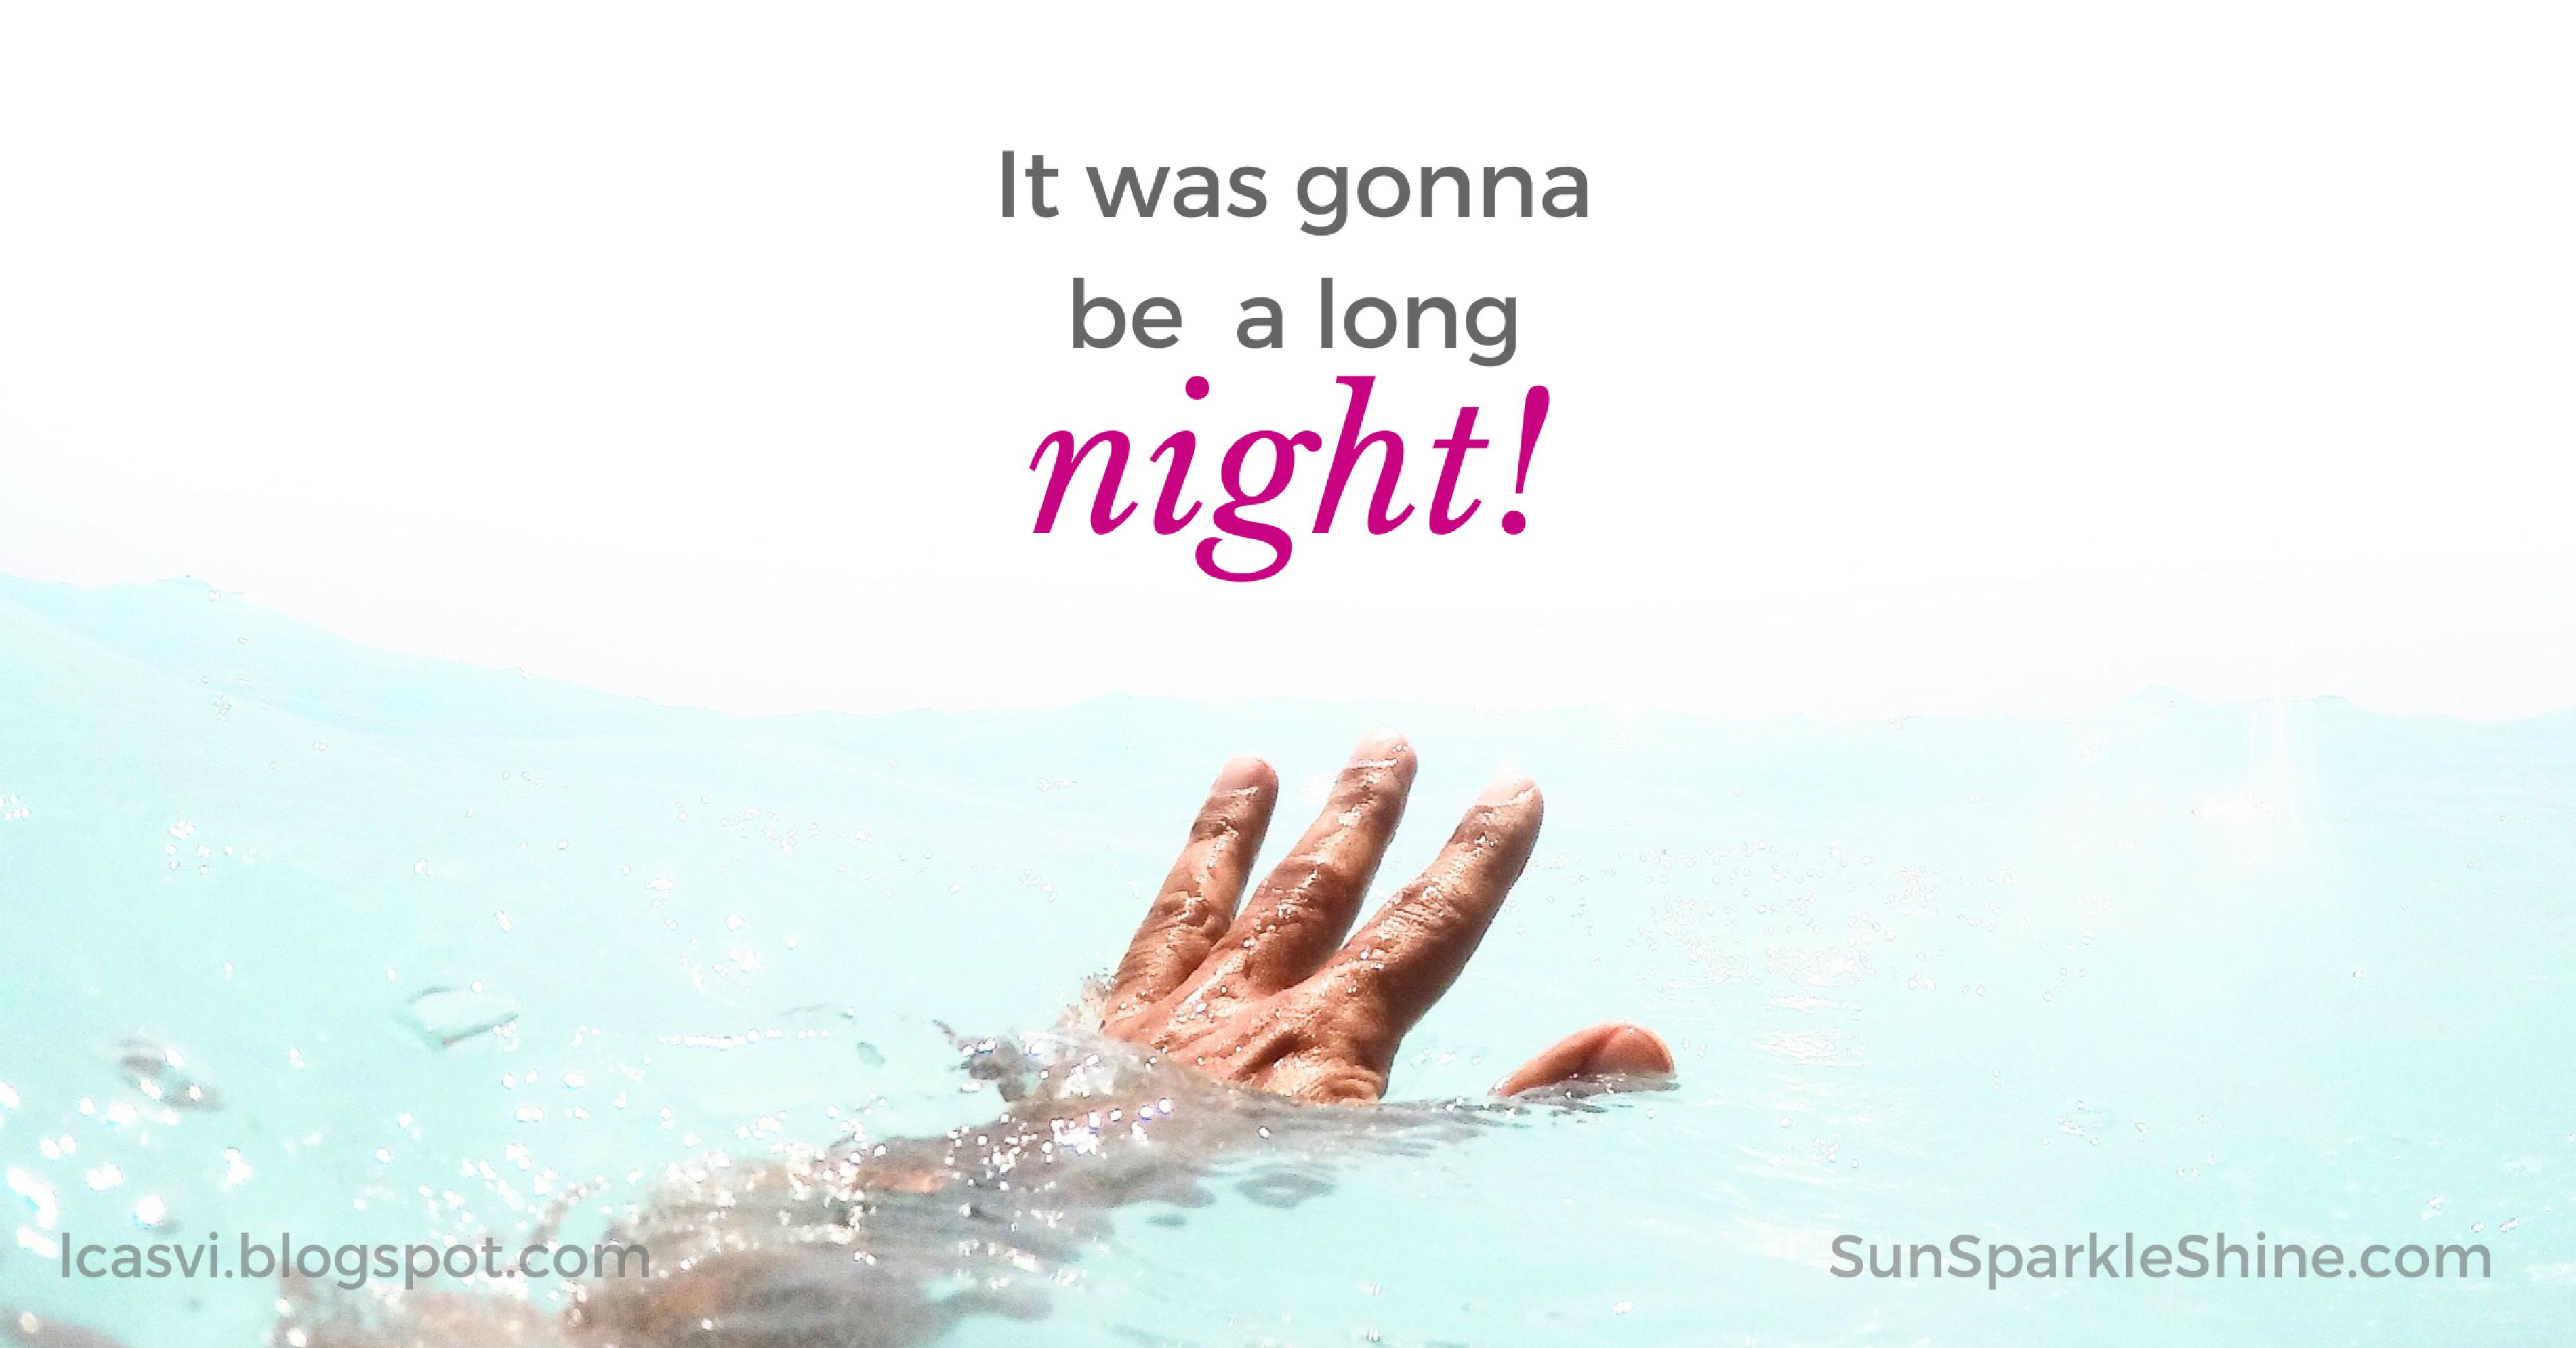 When you wish you had someone to talk to, where do you turn? Hope | Encouragement | Christian Women | Friendship | Community | SunSparkleShine.com